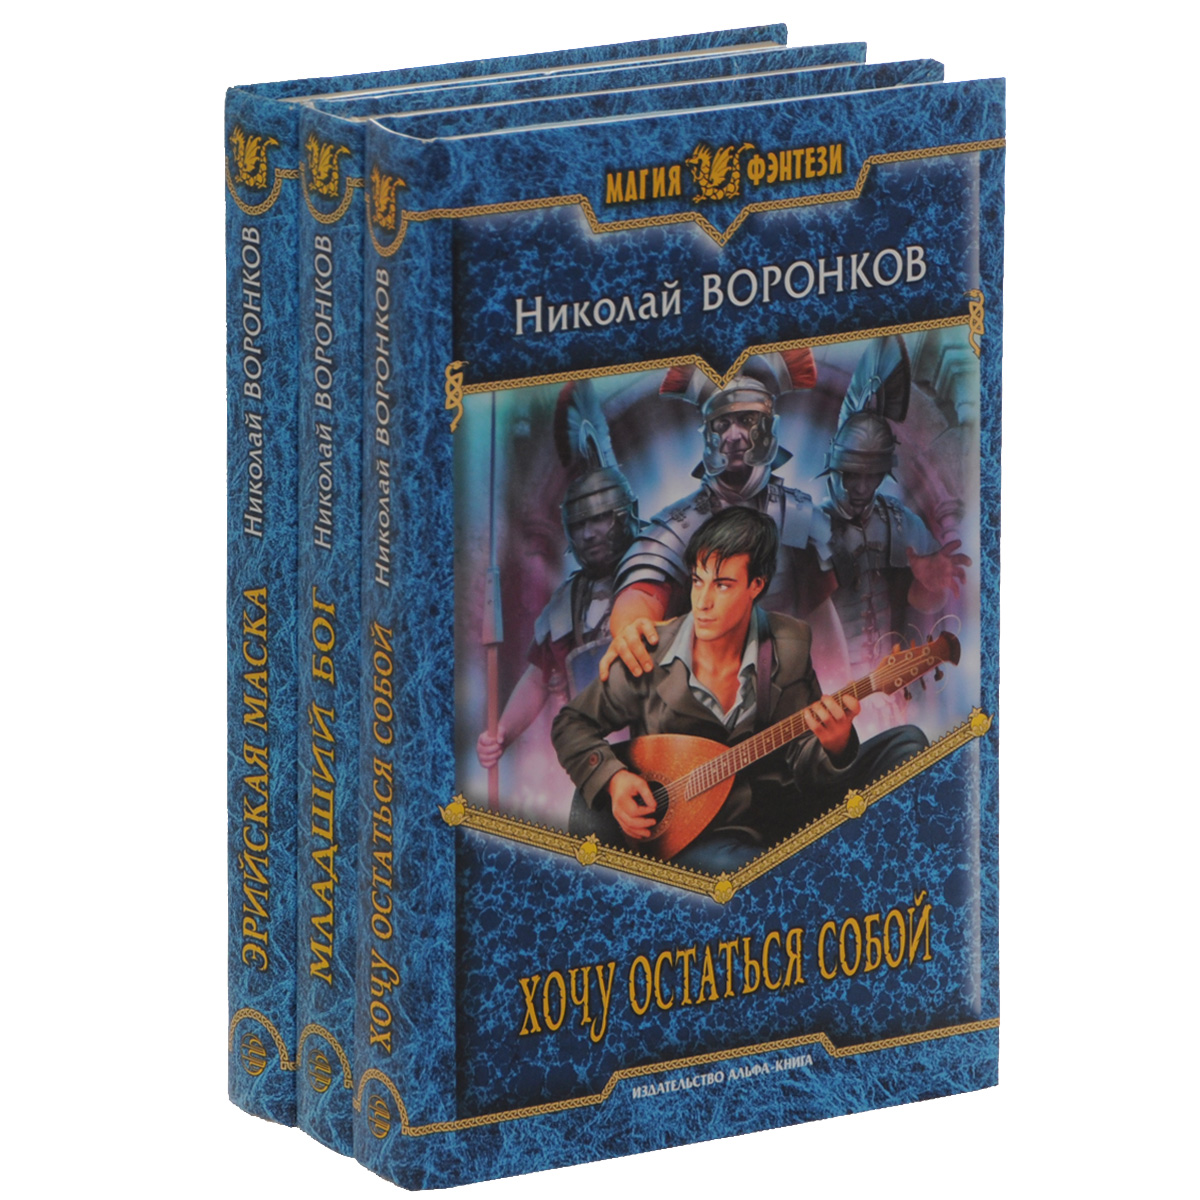 Николай Воронков Николай Воронков (комплект из 3 книг) цена